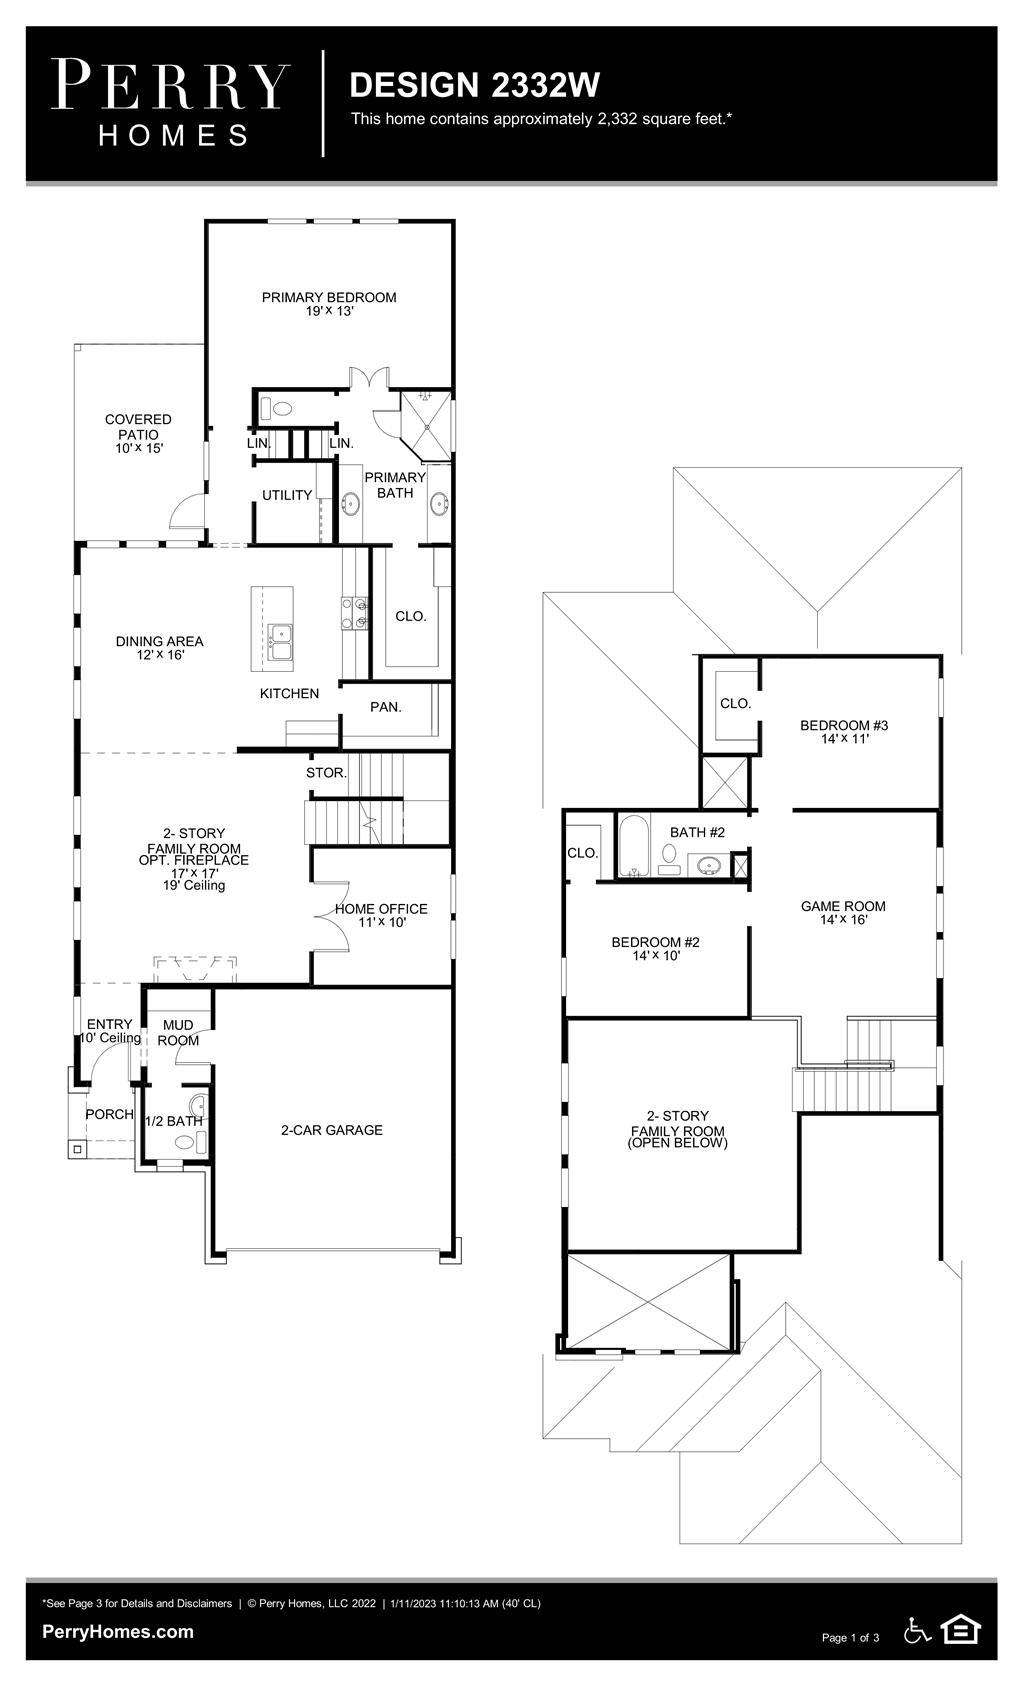 Floor Plan for 2332W